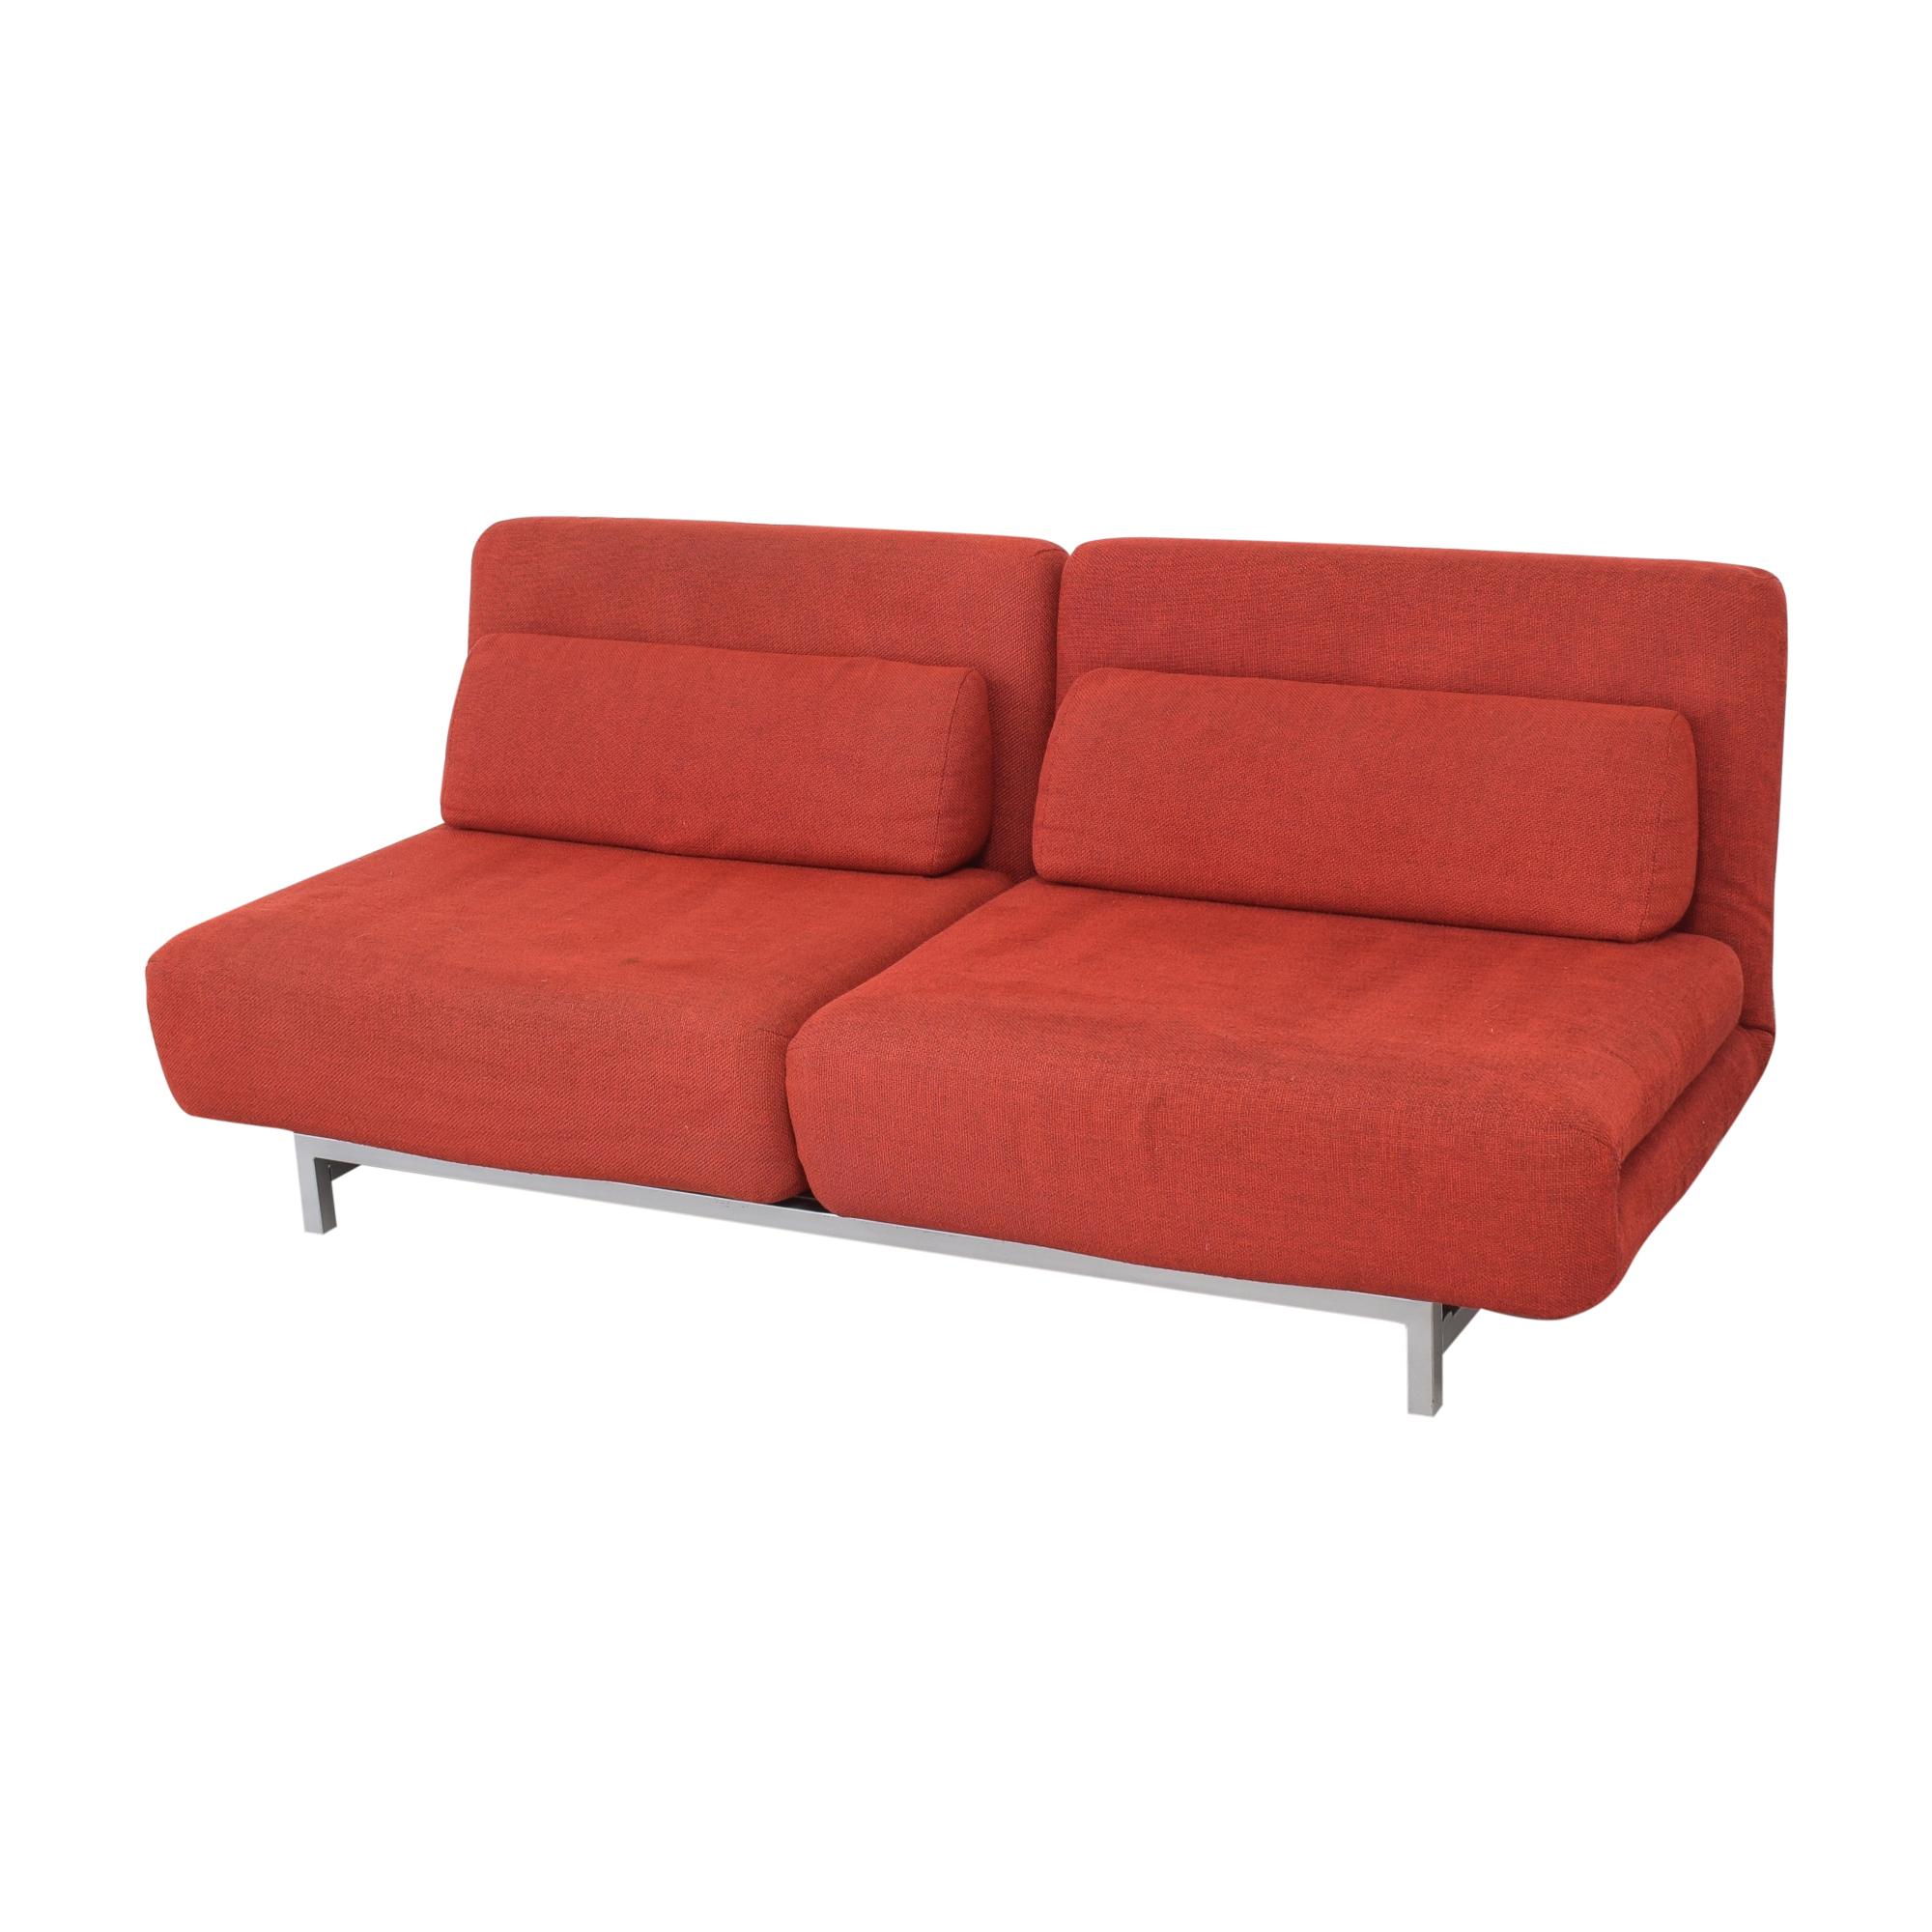 buy IDO IDO Swivel Convertible Sofa Bed online